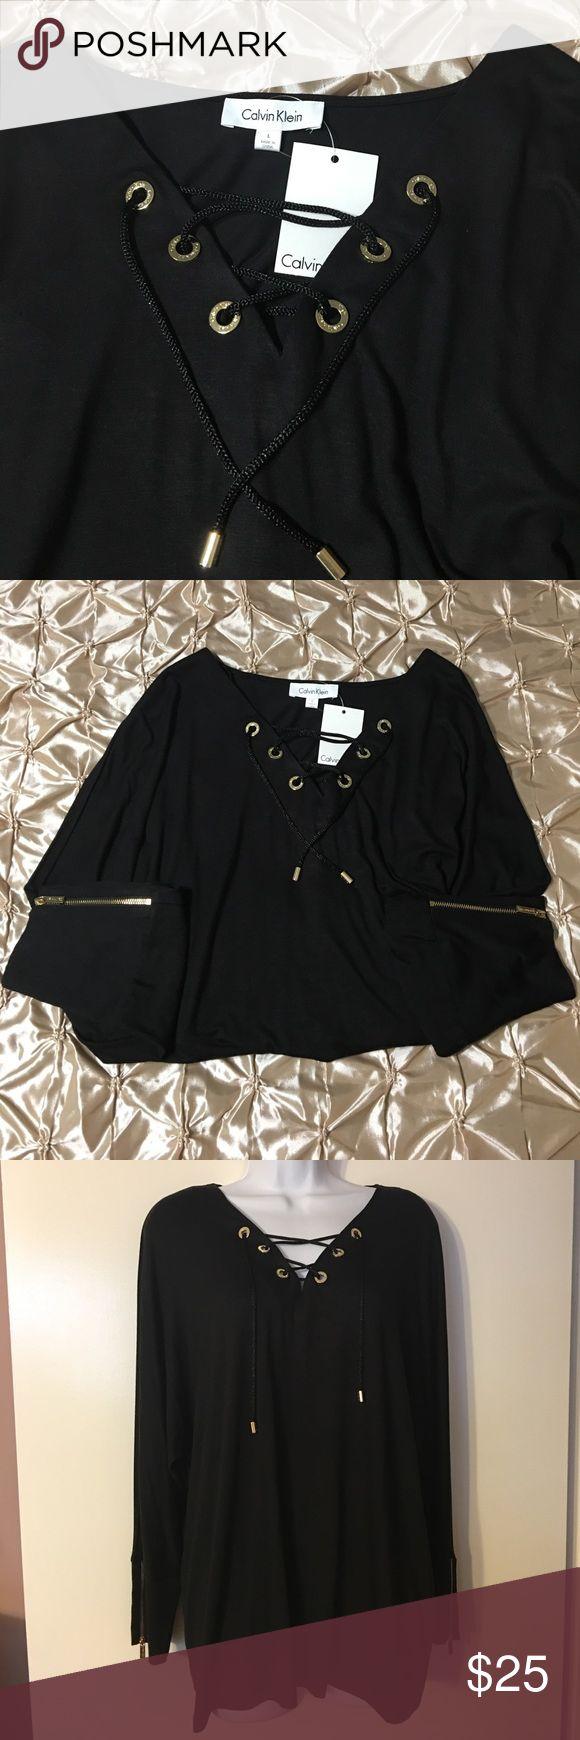 Calvin Klein Women's Top NWT  Klein Women's Embellished Dolman Pullover Top Black L Calvin Klein Tops Blouses